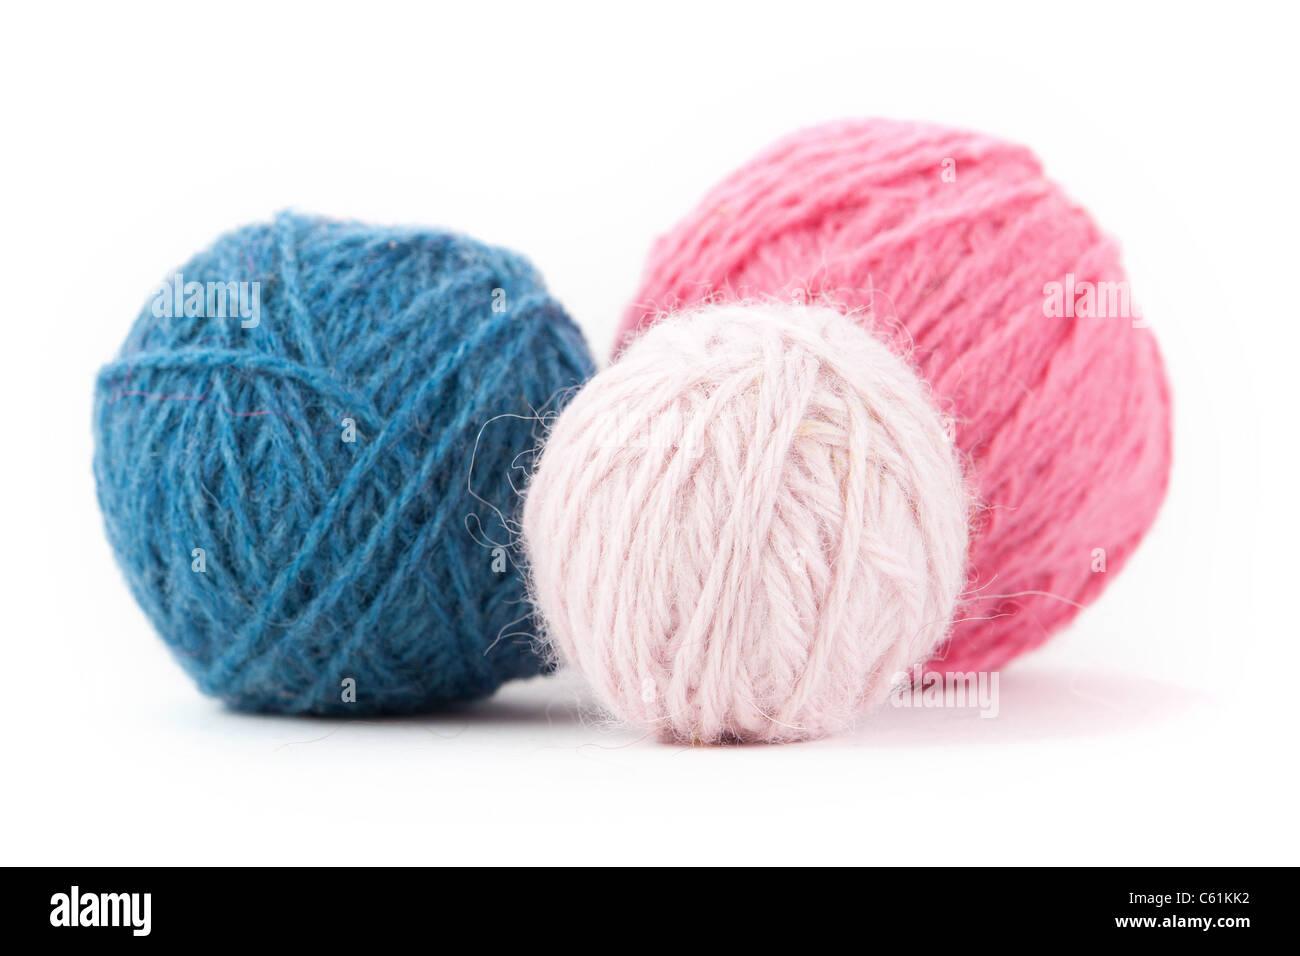 Set of Pastel Tone Yarn Balls - Stock Image